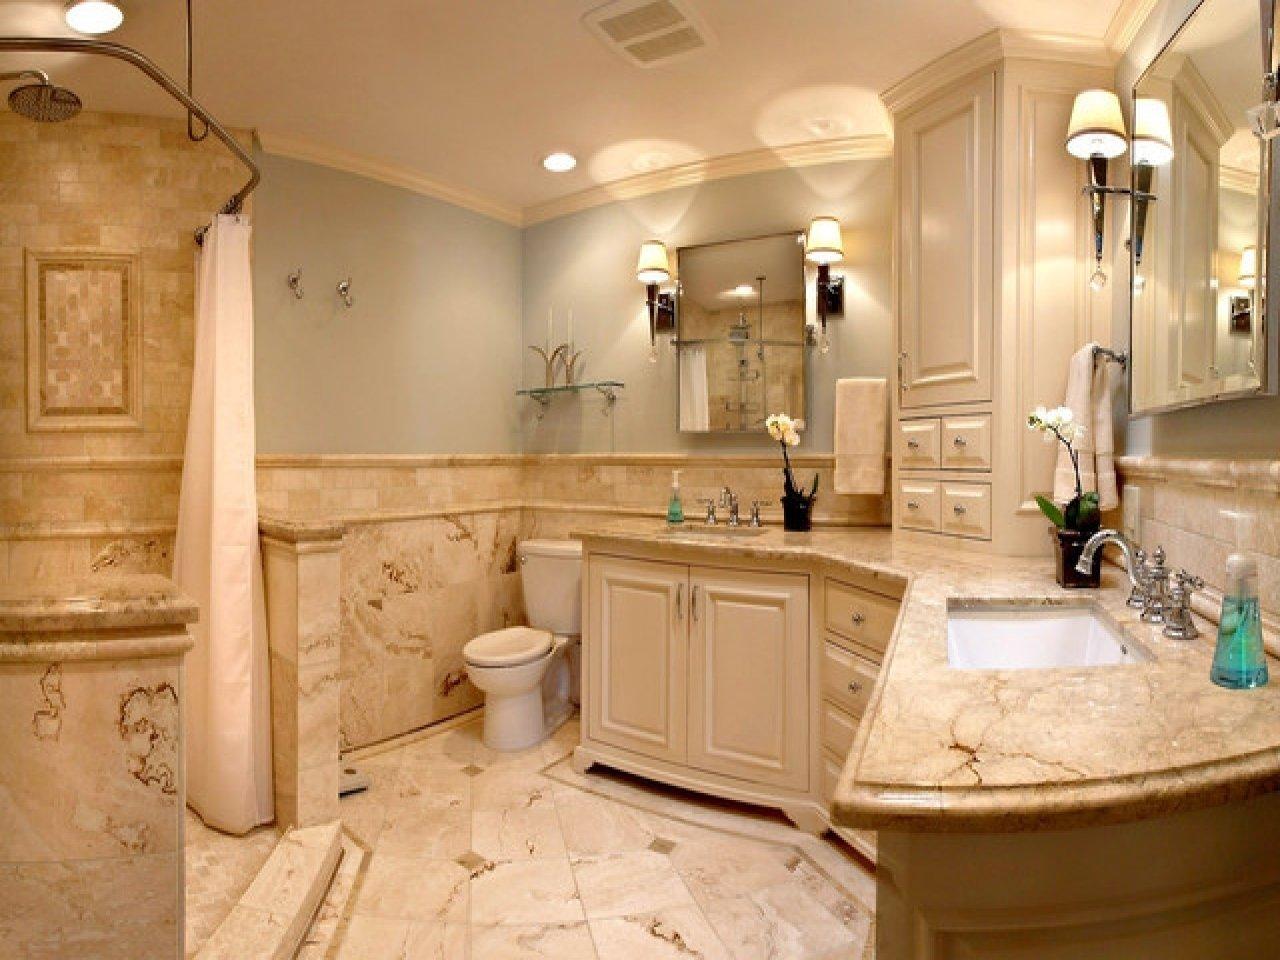 10 Stylish Master Bedroom And Bathroom Ideas bathroom ideas for master bedroom e280a2 bathroom ideas 2021